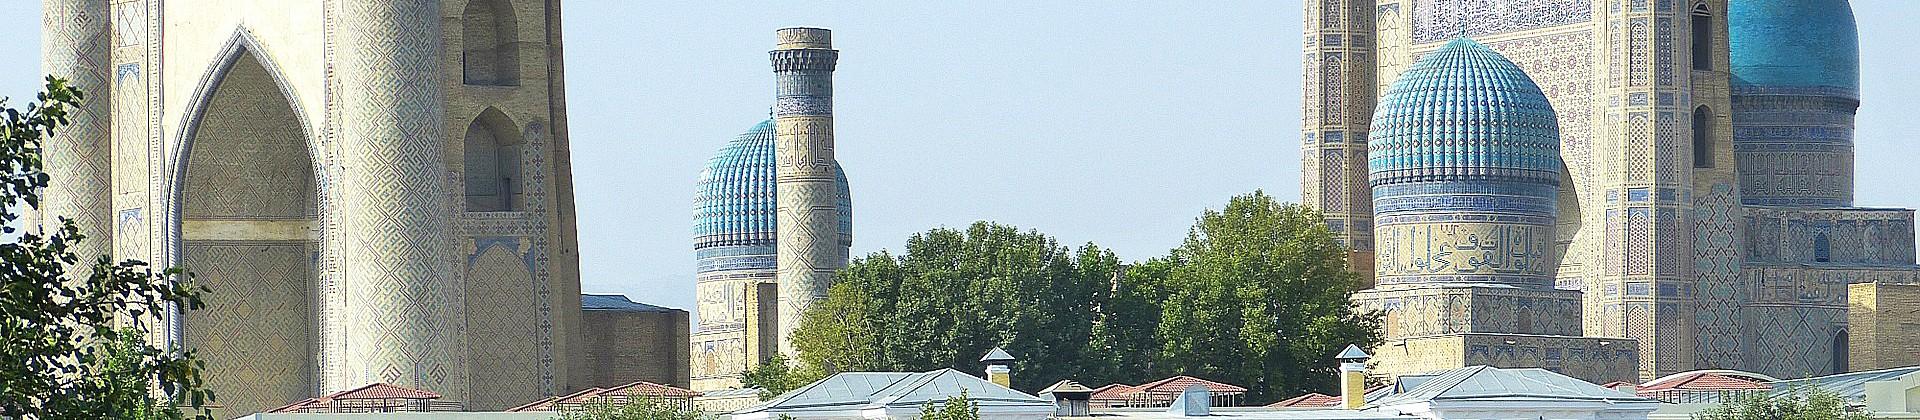 Uzbekistan 6 days Tour from Istanbul (Economy) - 1